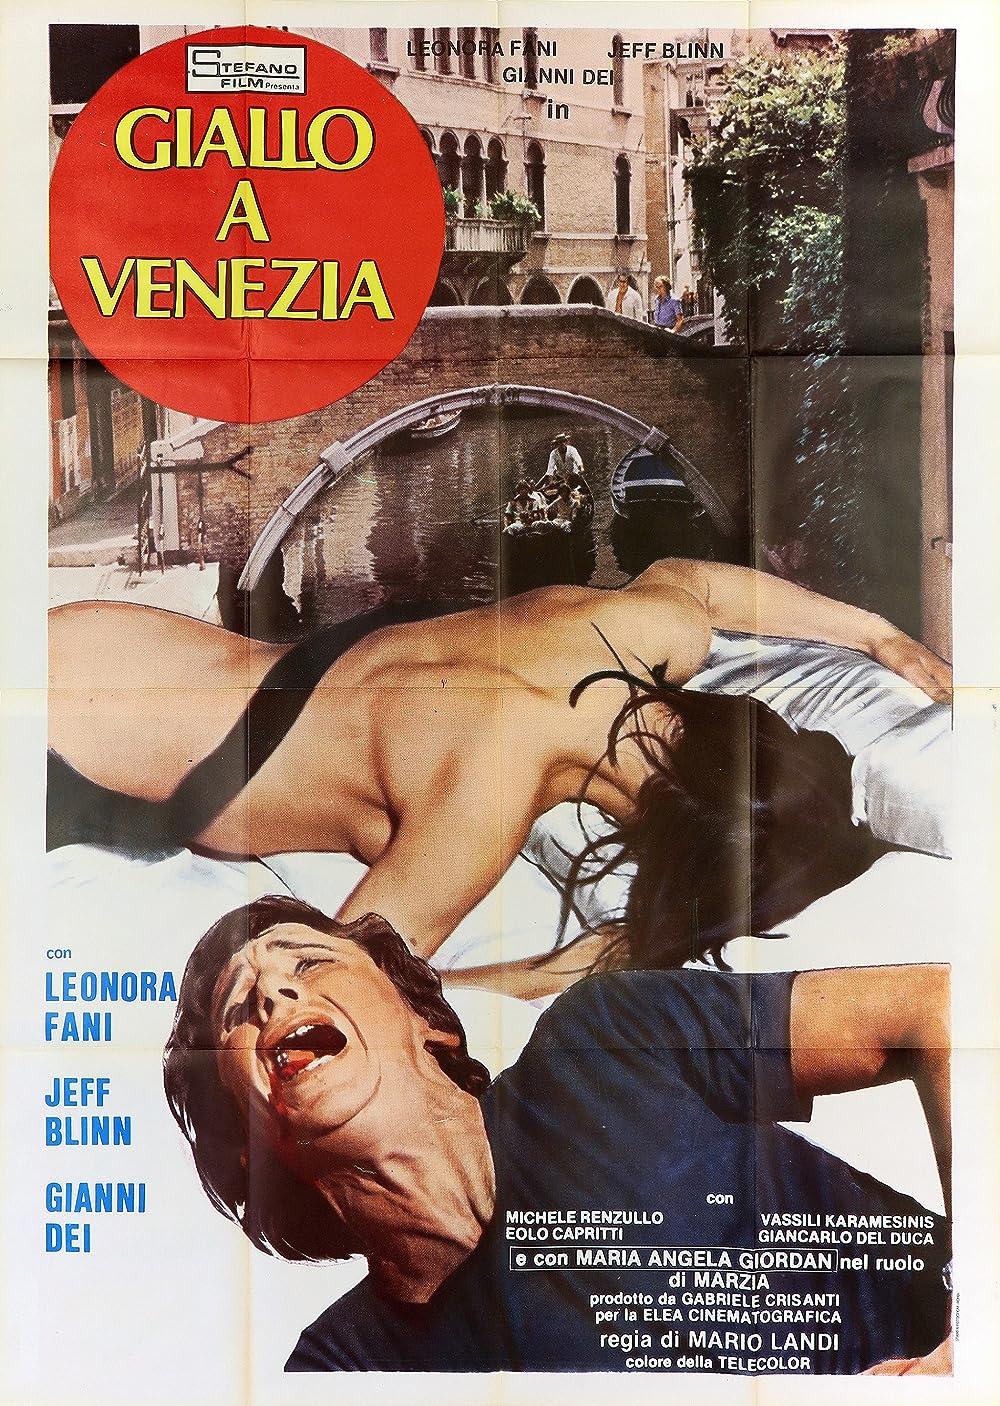 18+ Giallo A Venezia 1979 English 1080p BluRay ESub 1.67GB Download